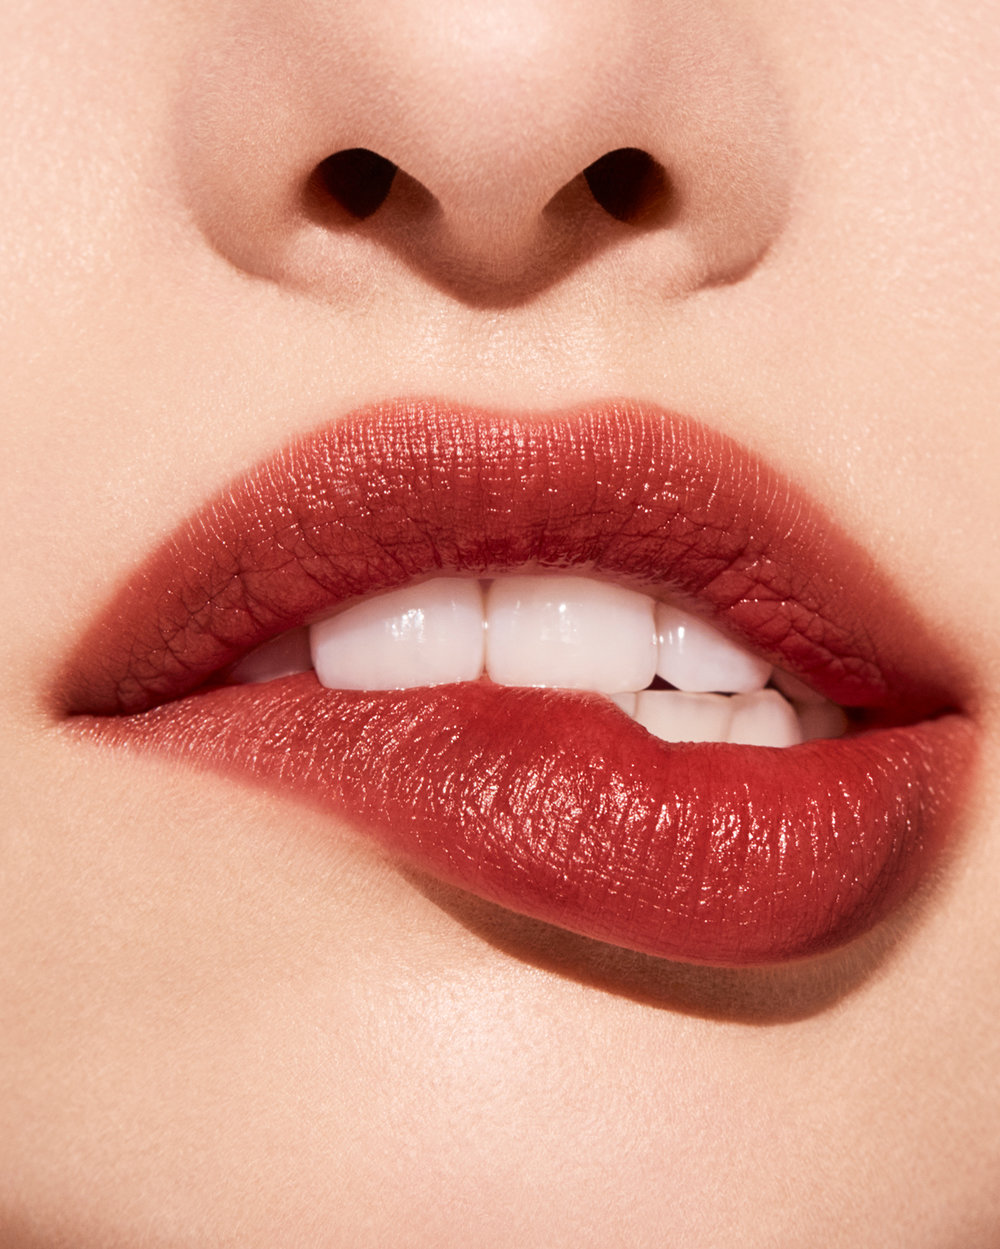 COMITA_180126_BOBBI-BROWN_Lips-Social-06-Stills-028_B.jpg